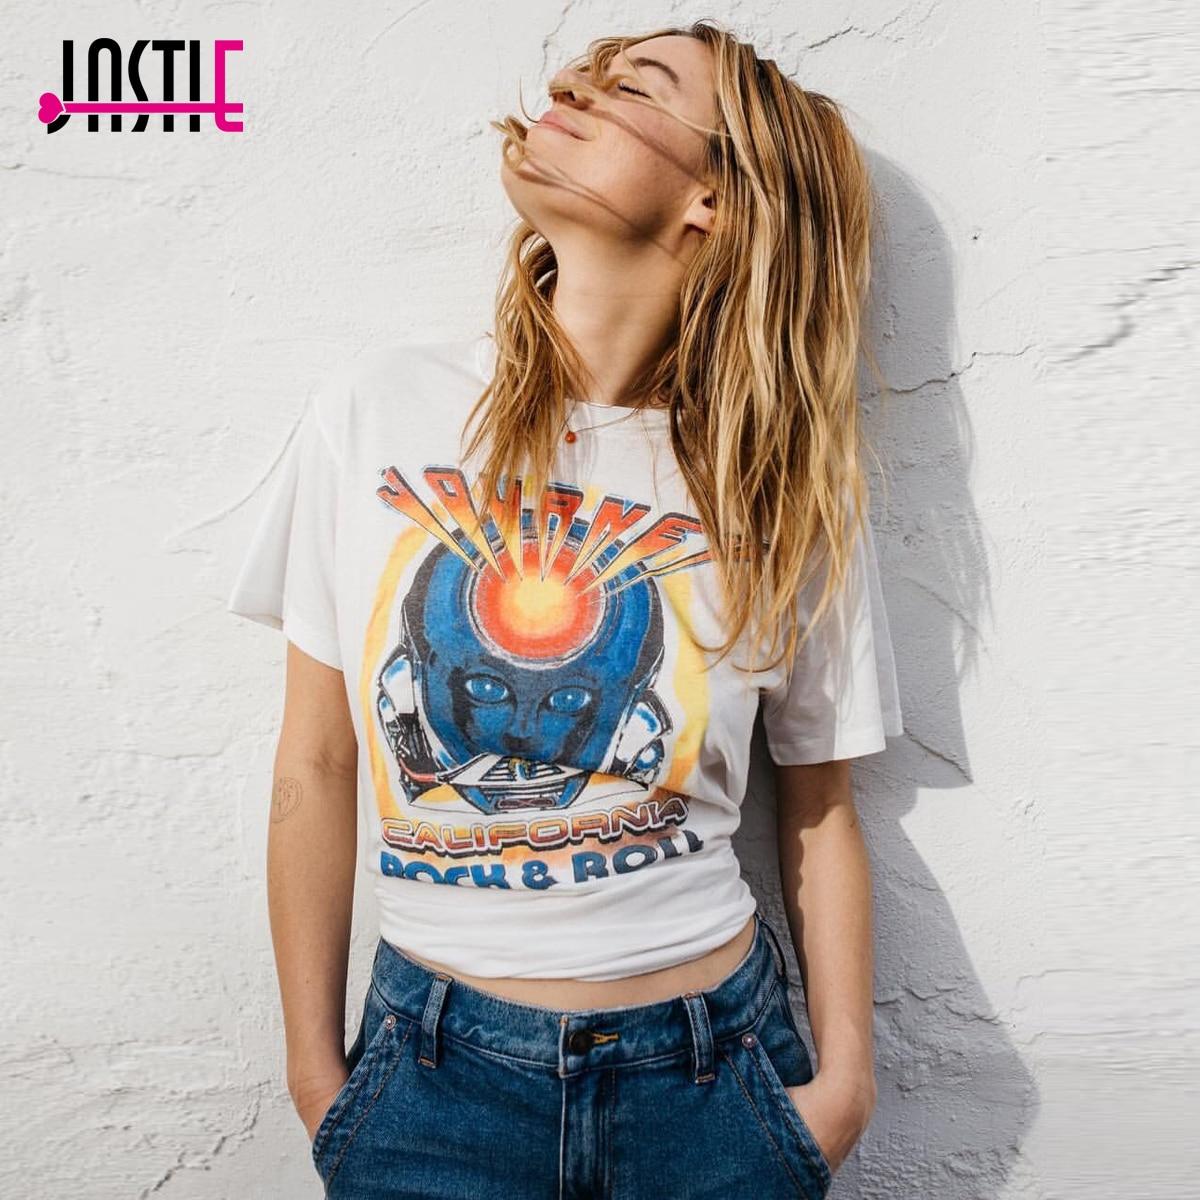 ebdc92b26967 Jastie O-Neck Short Sleeve Tee Casual Women Shirt Tops Rock N Roll Pattern  Print